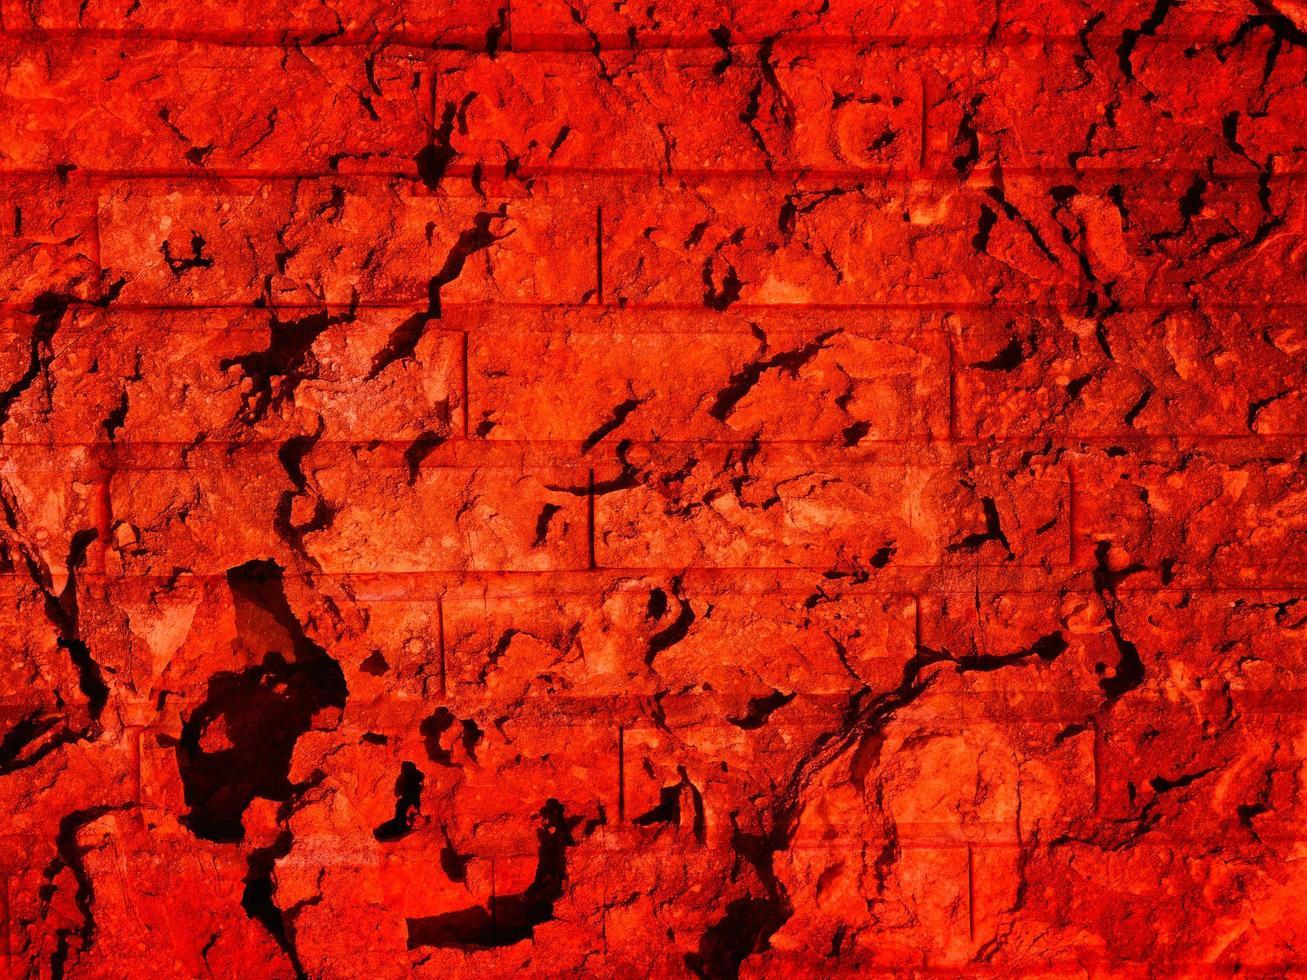 röd stenstruktur foto